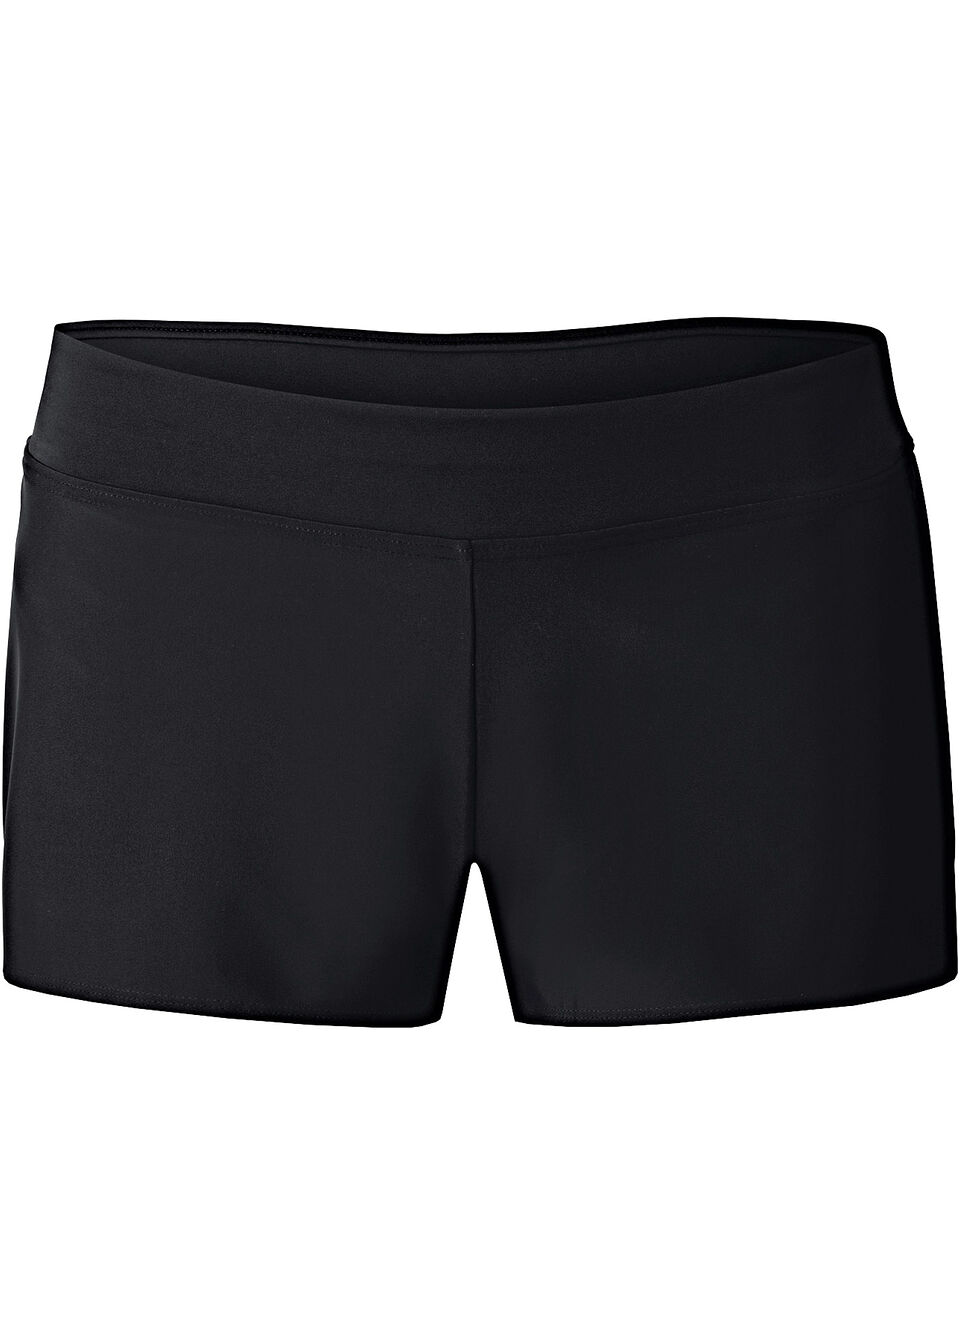 Pantaloni scurți bonprix